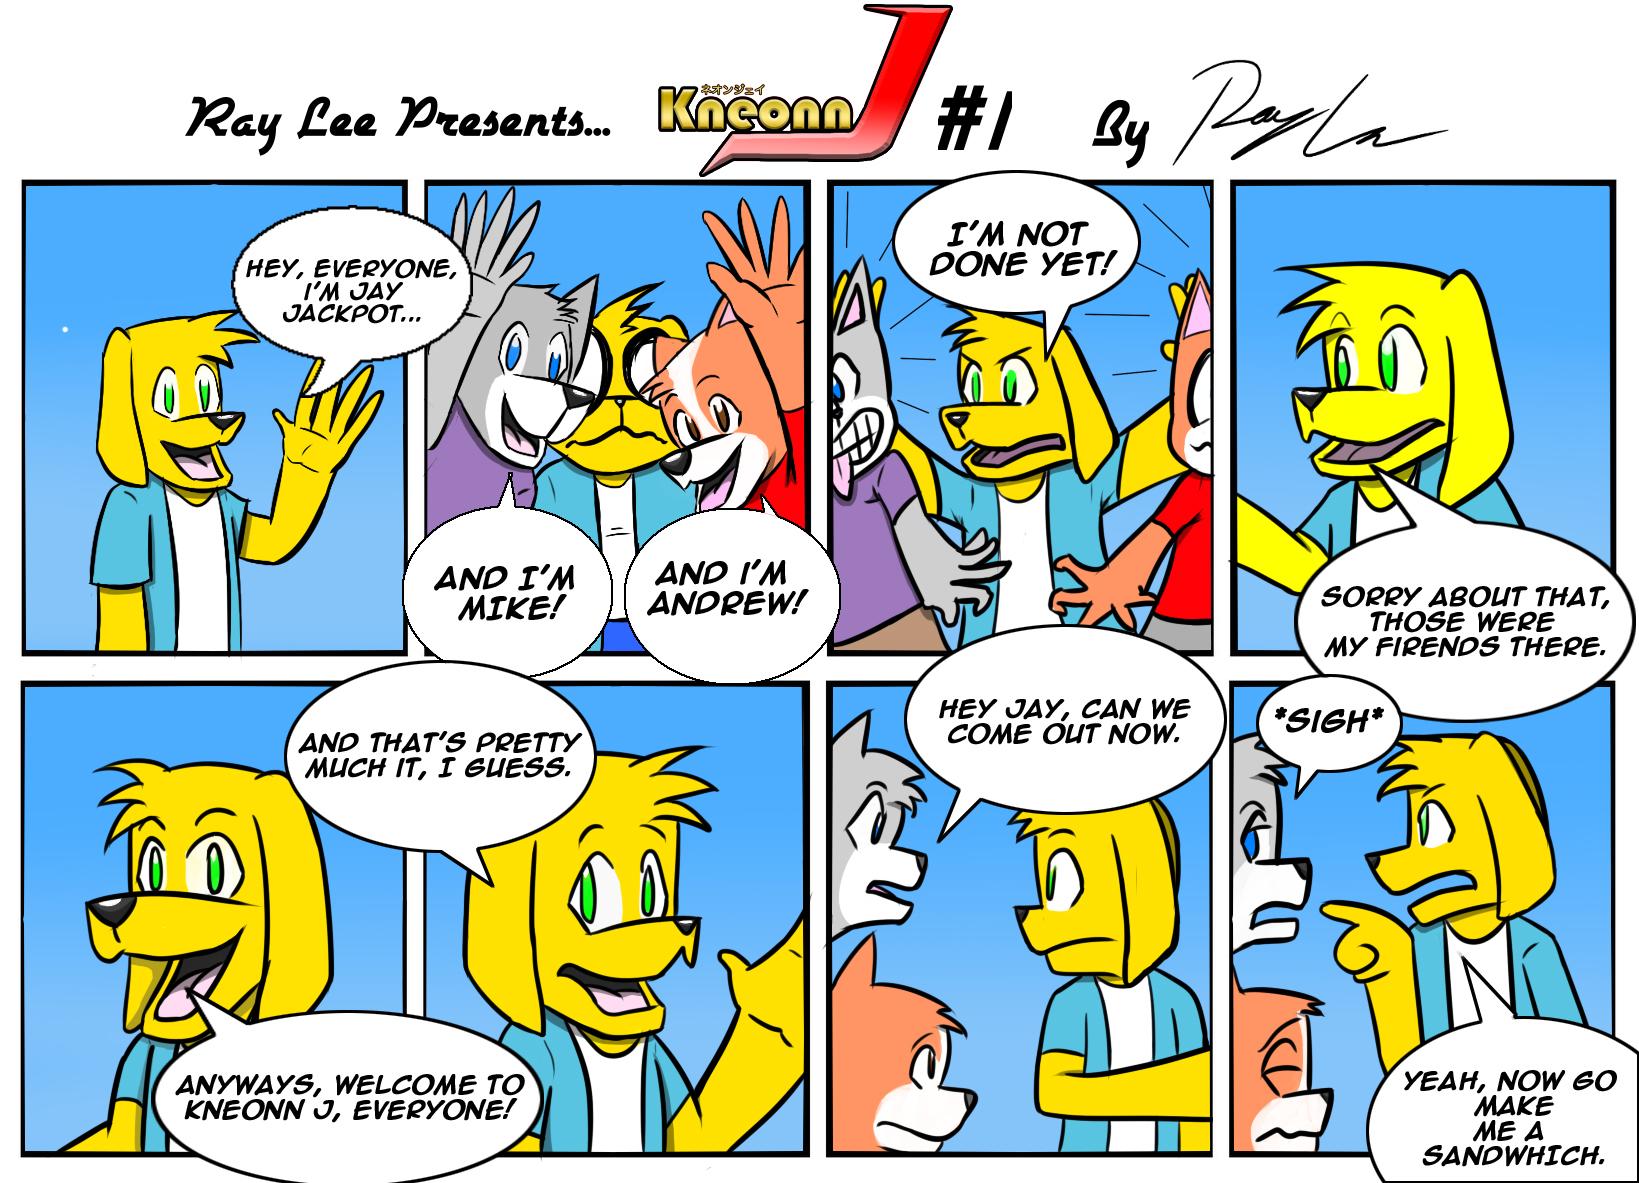 Kneonn J: The Comic #1